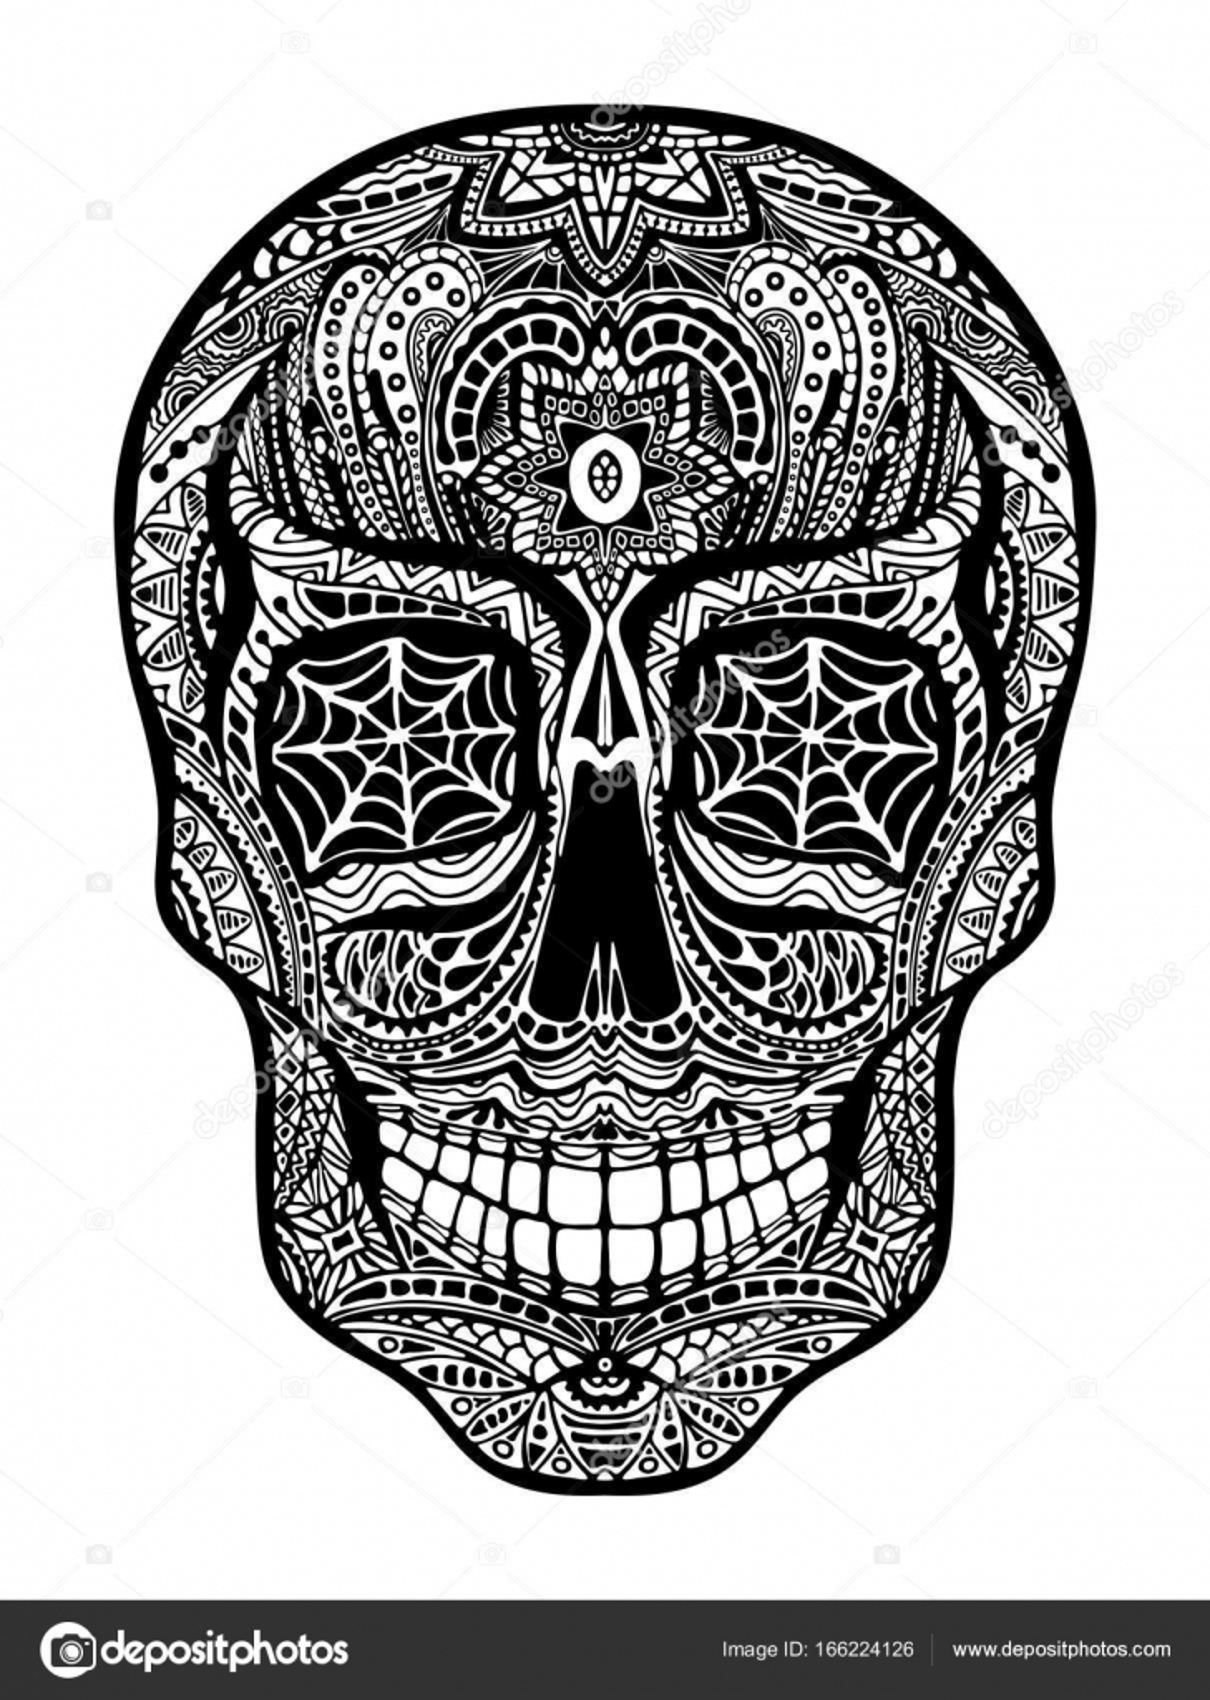 tattoo totenkopf badass crazy skull tattoos 36 totenkopf rosen tattoo am bein trash tattoo. Black Bedroom Furniture Sets. Home Design Ideas